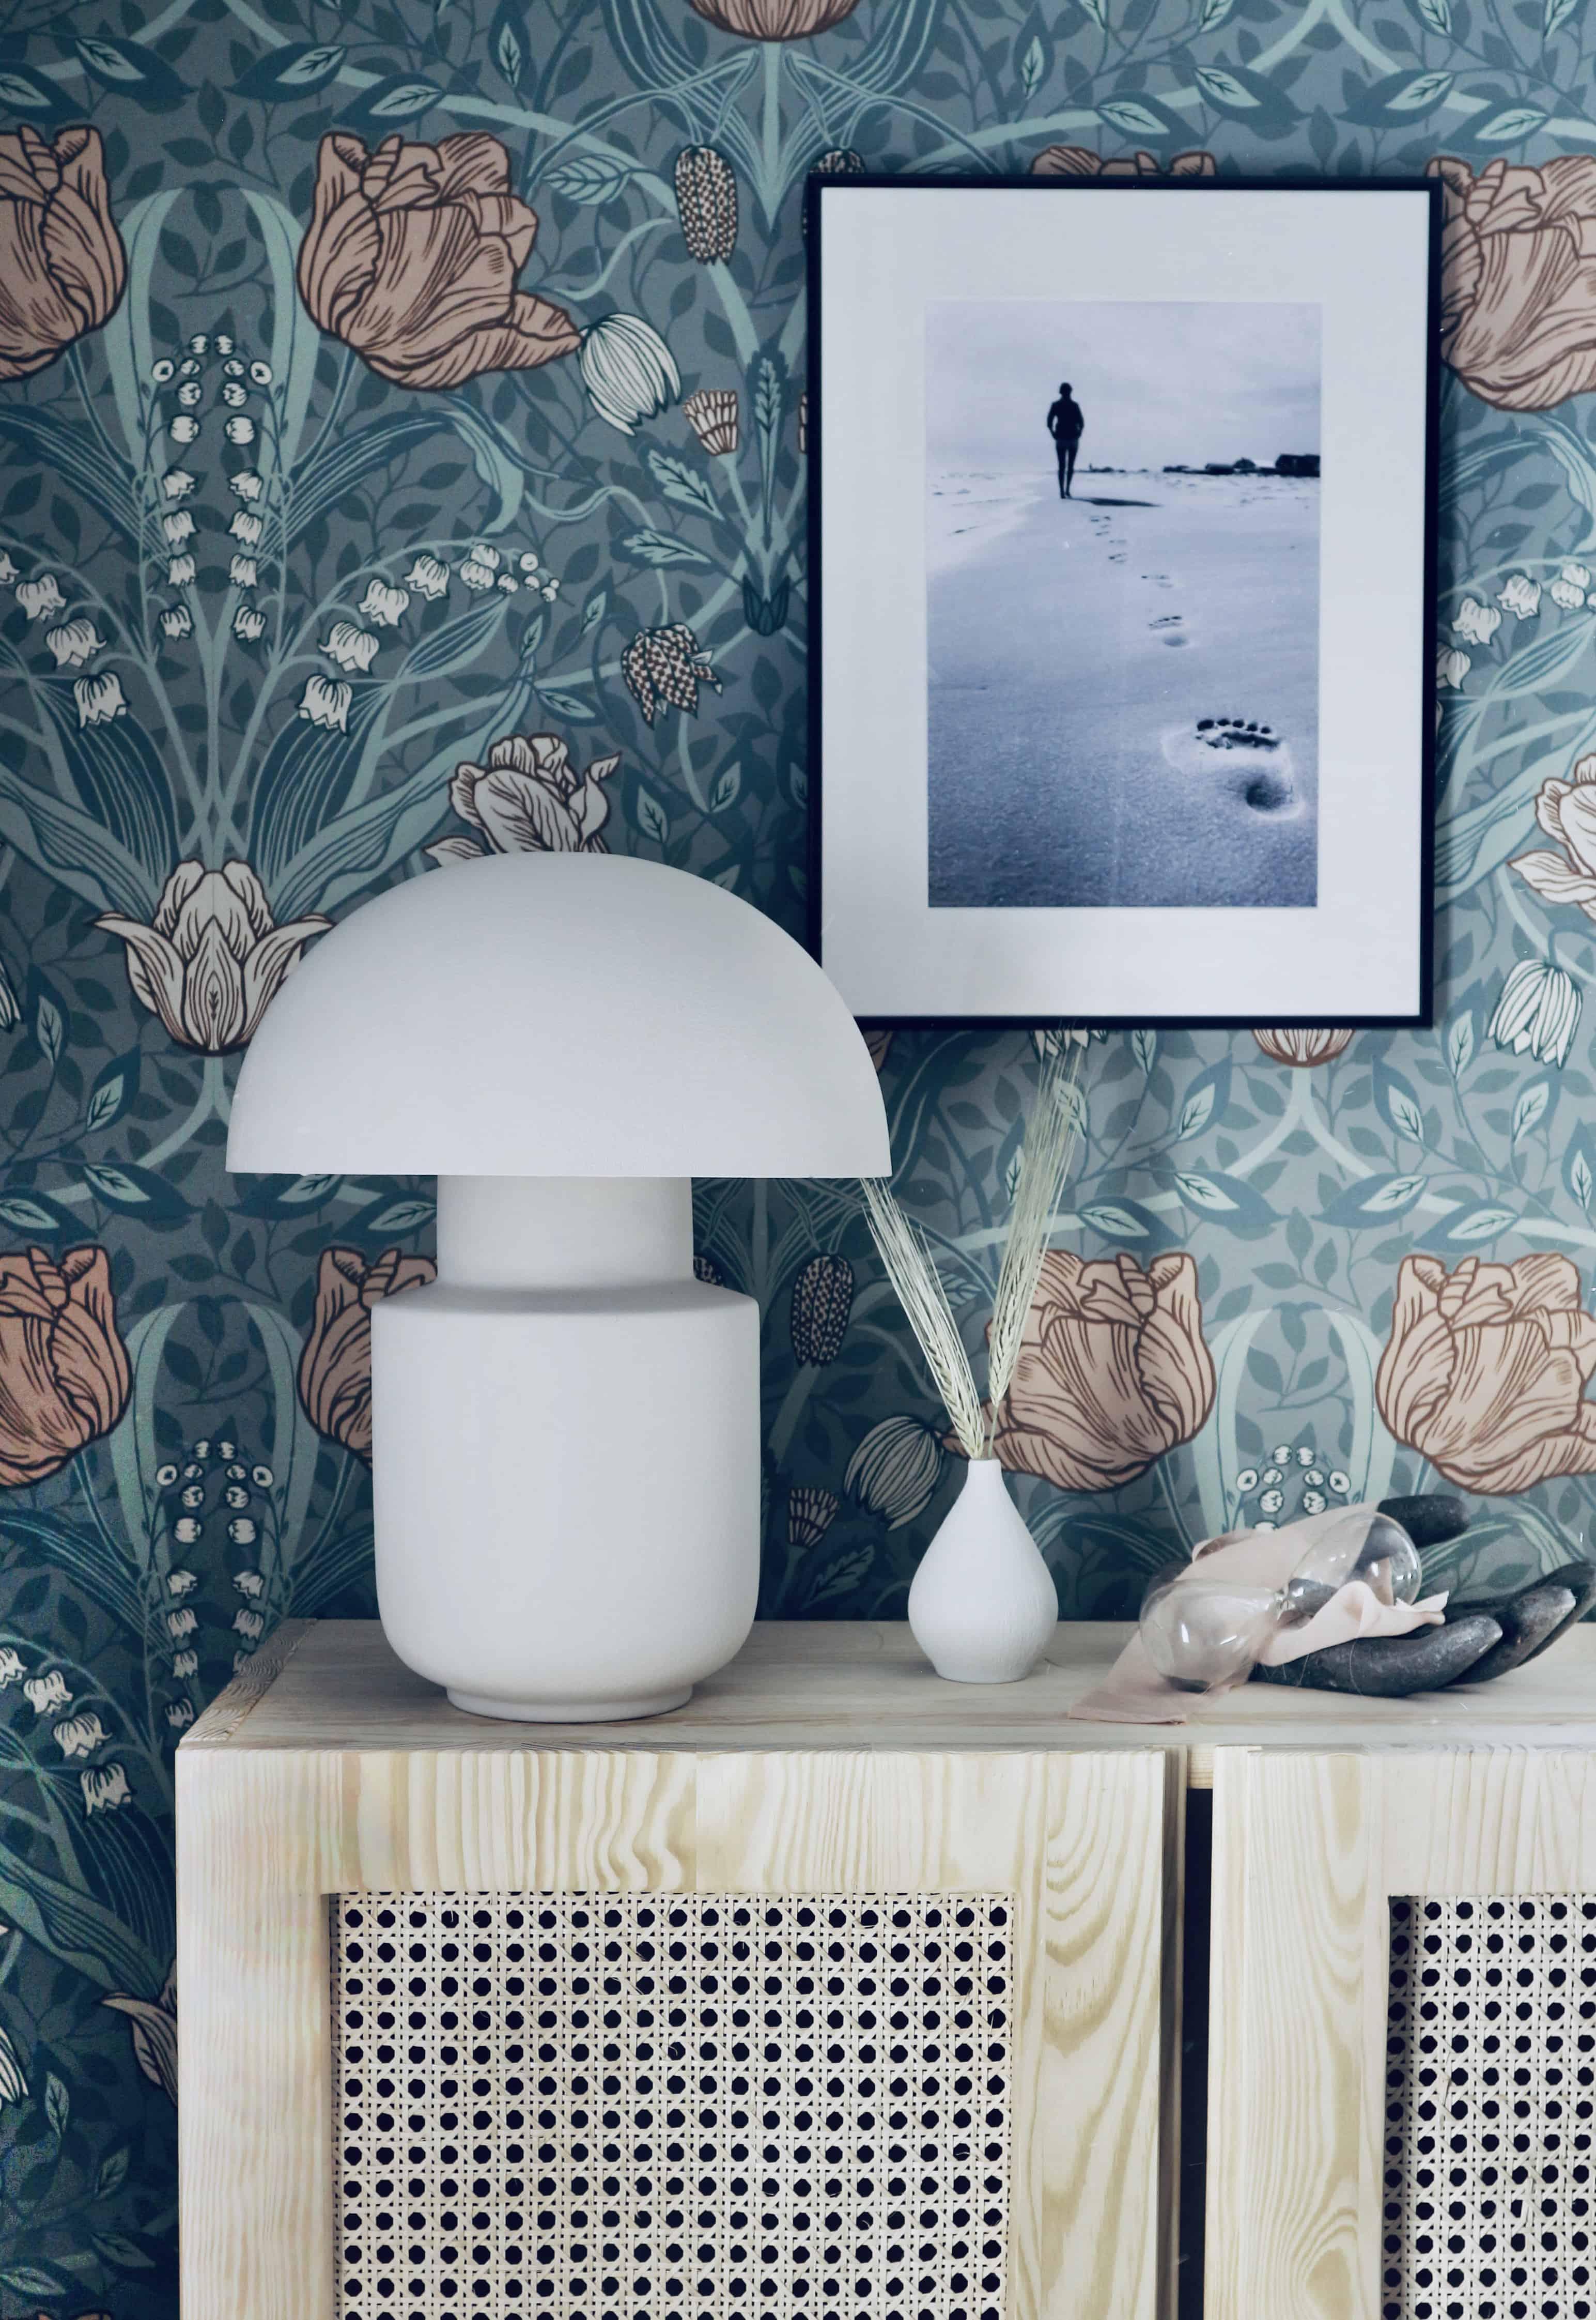 Ikea hack: Vas + skål = bordslampa